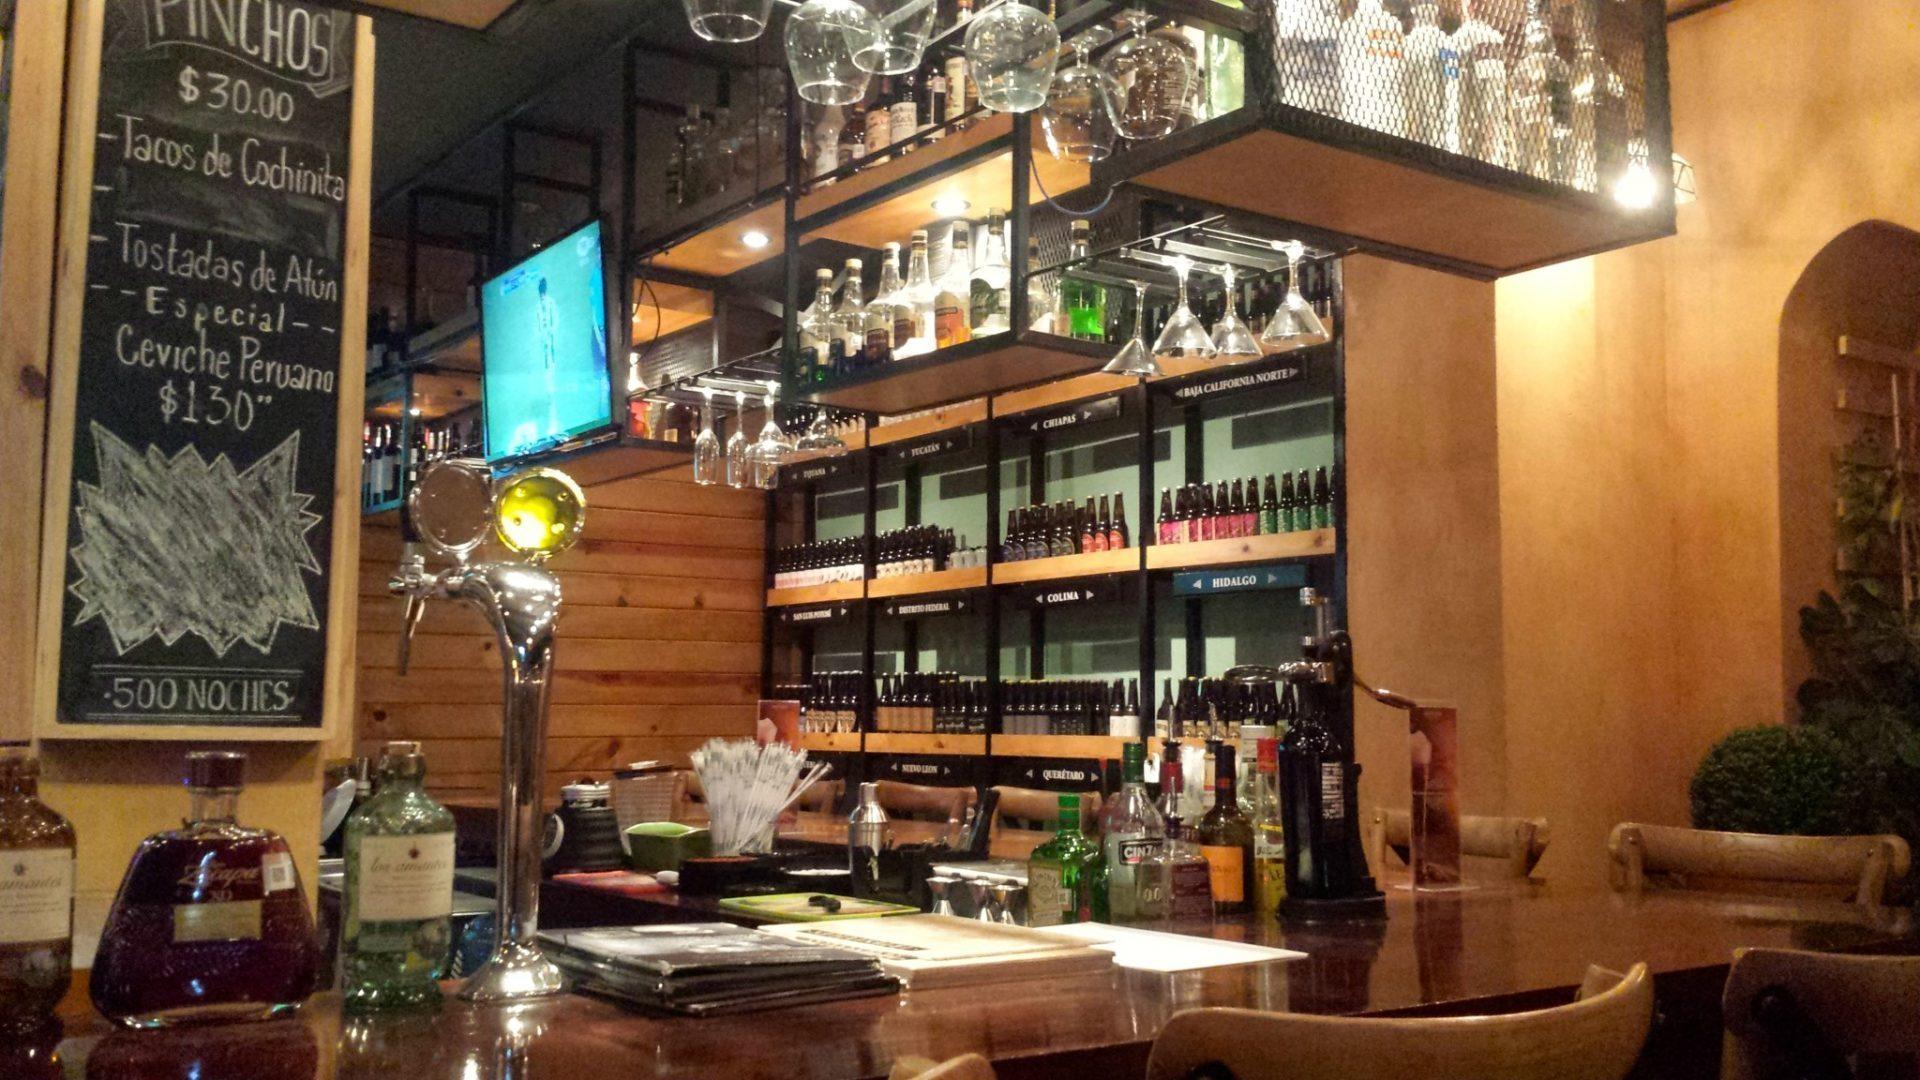 noche is a great in san cristobal de las casas to try cerveza artesanal